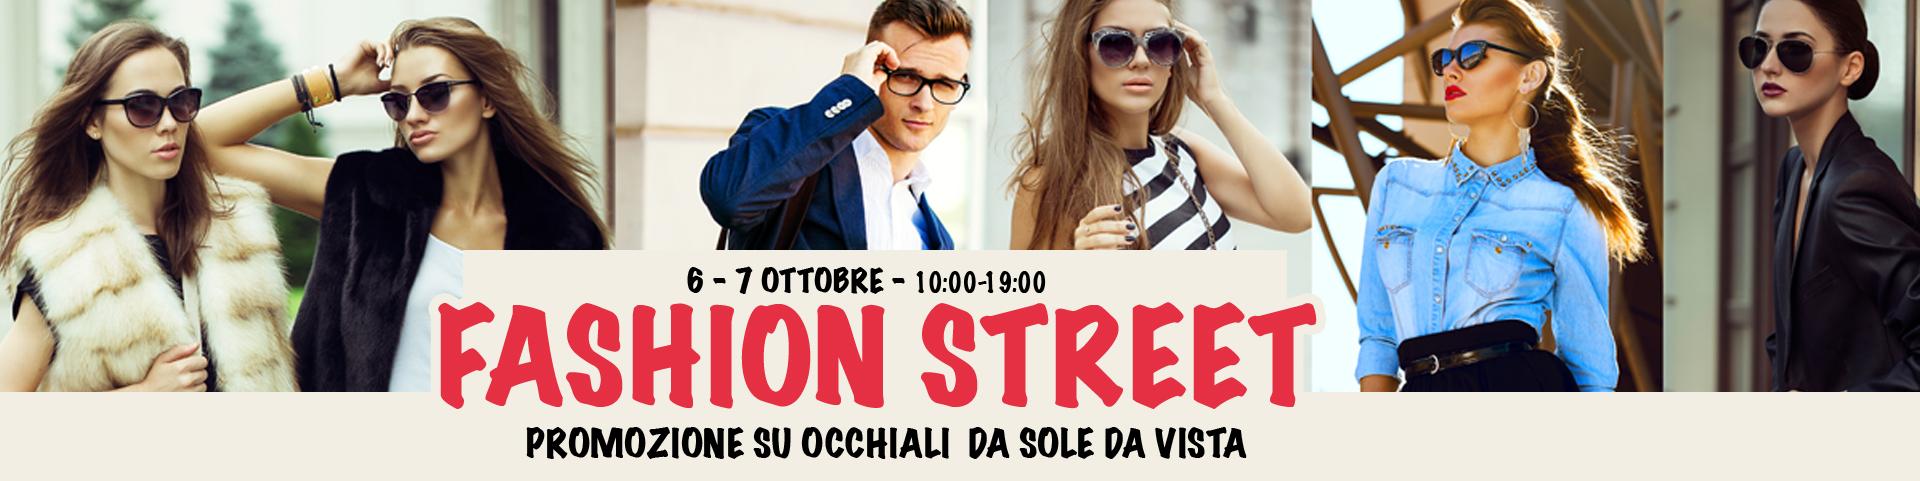 slider-sito-fashion-street-1920x481